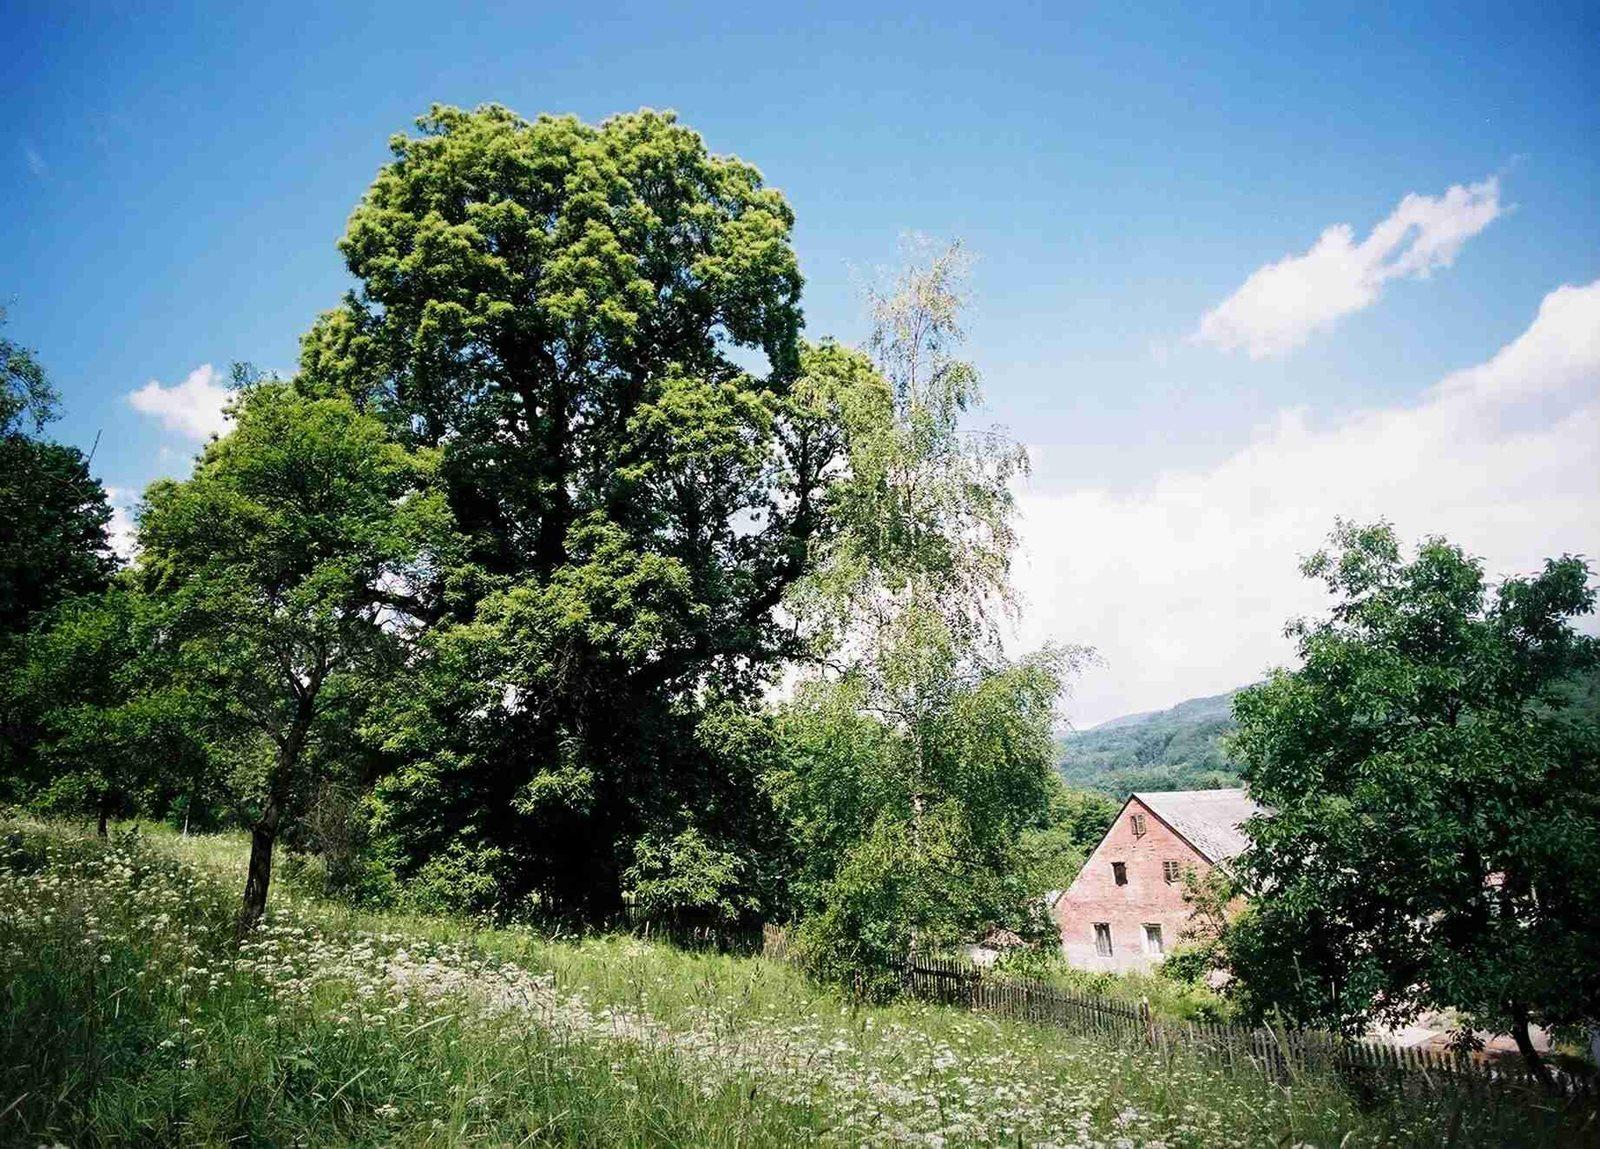 6-Kastanovnik-z-Doupovskych-hor-(1).jpg